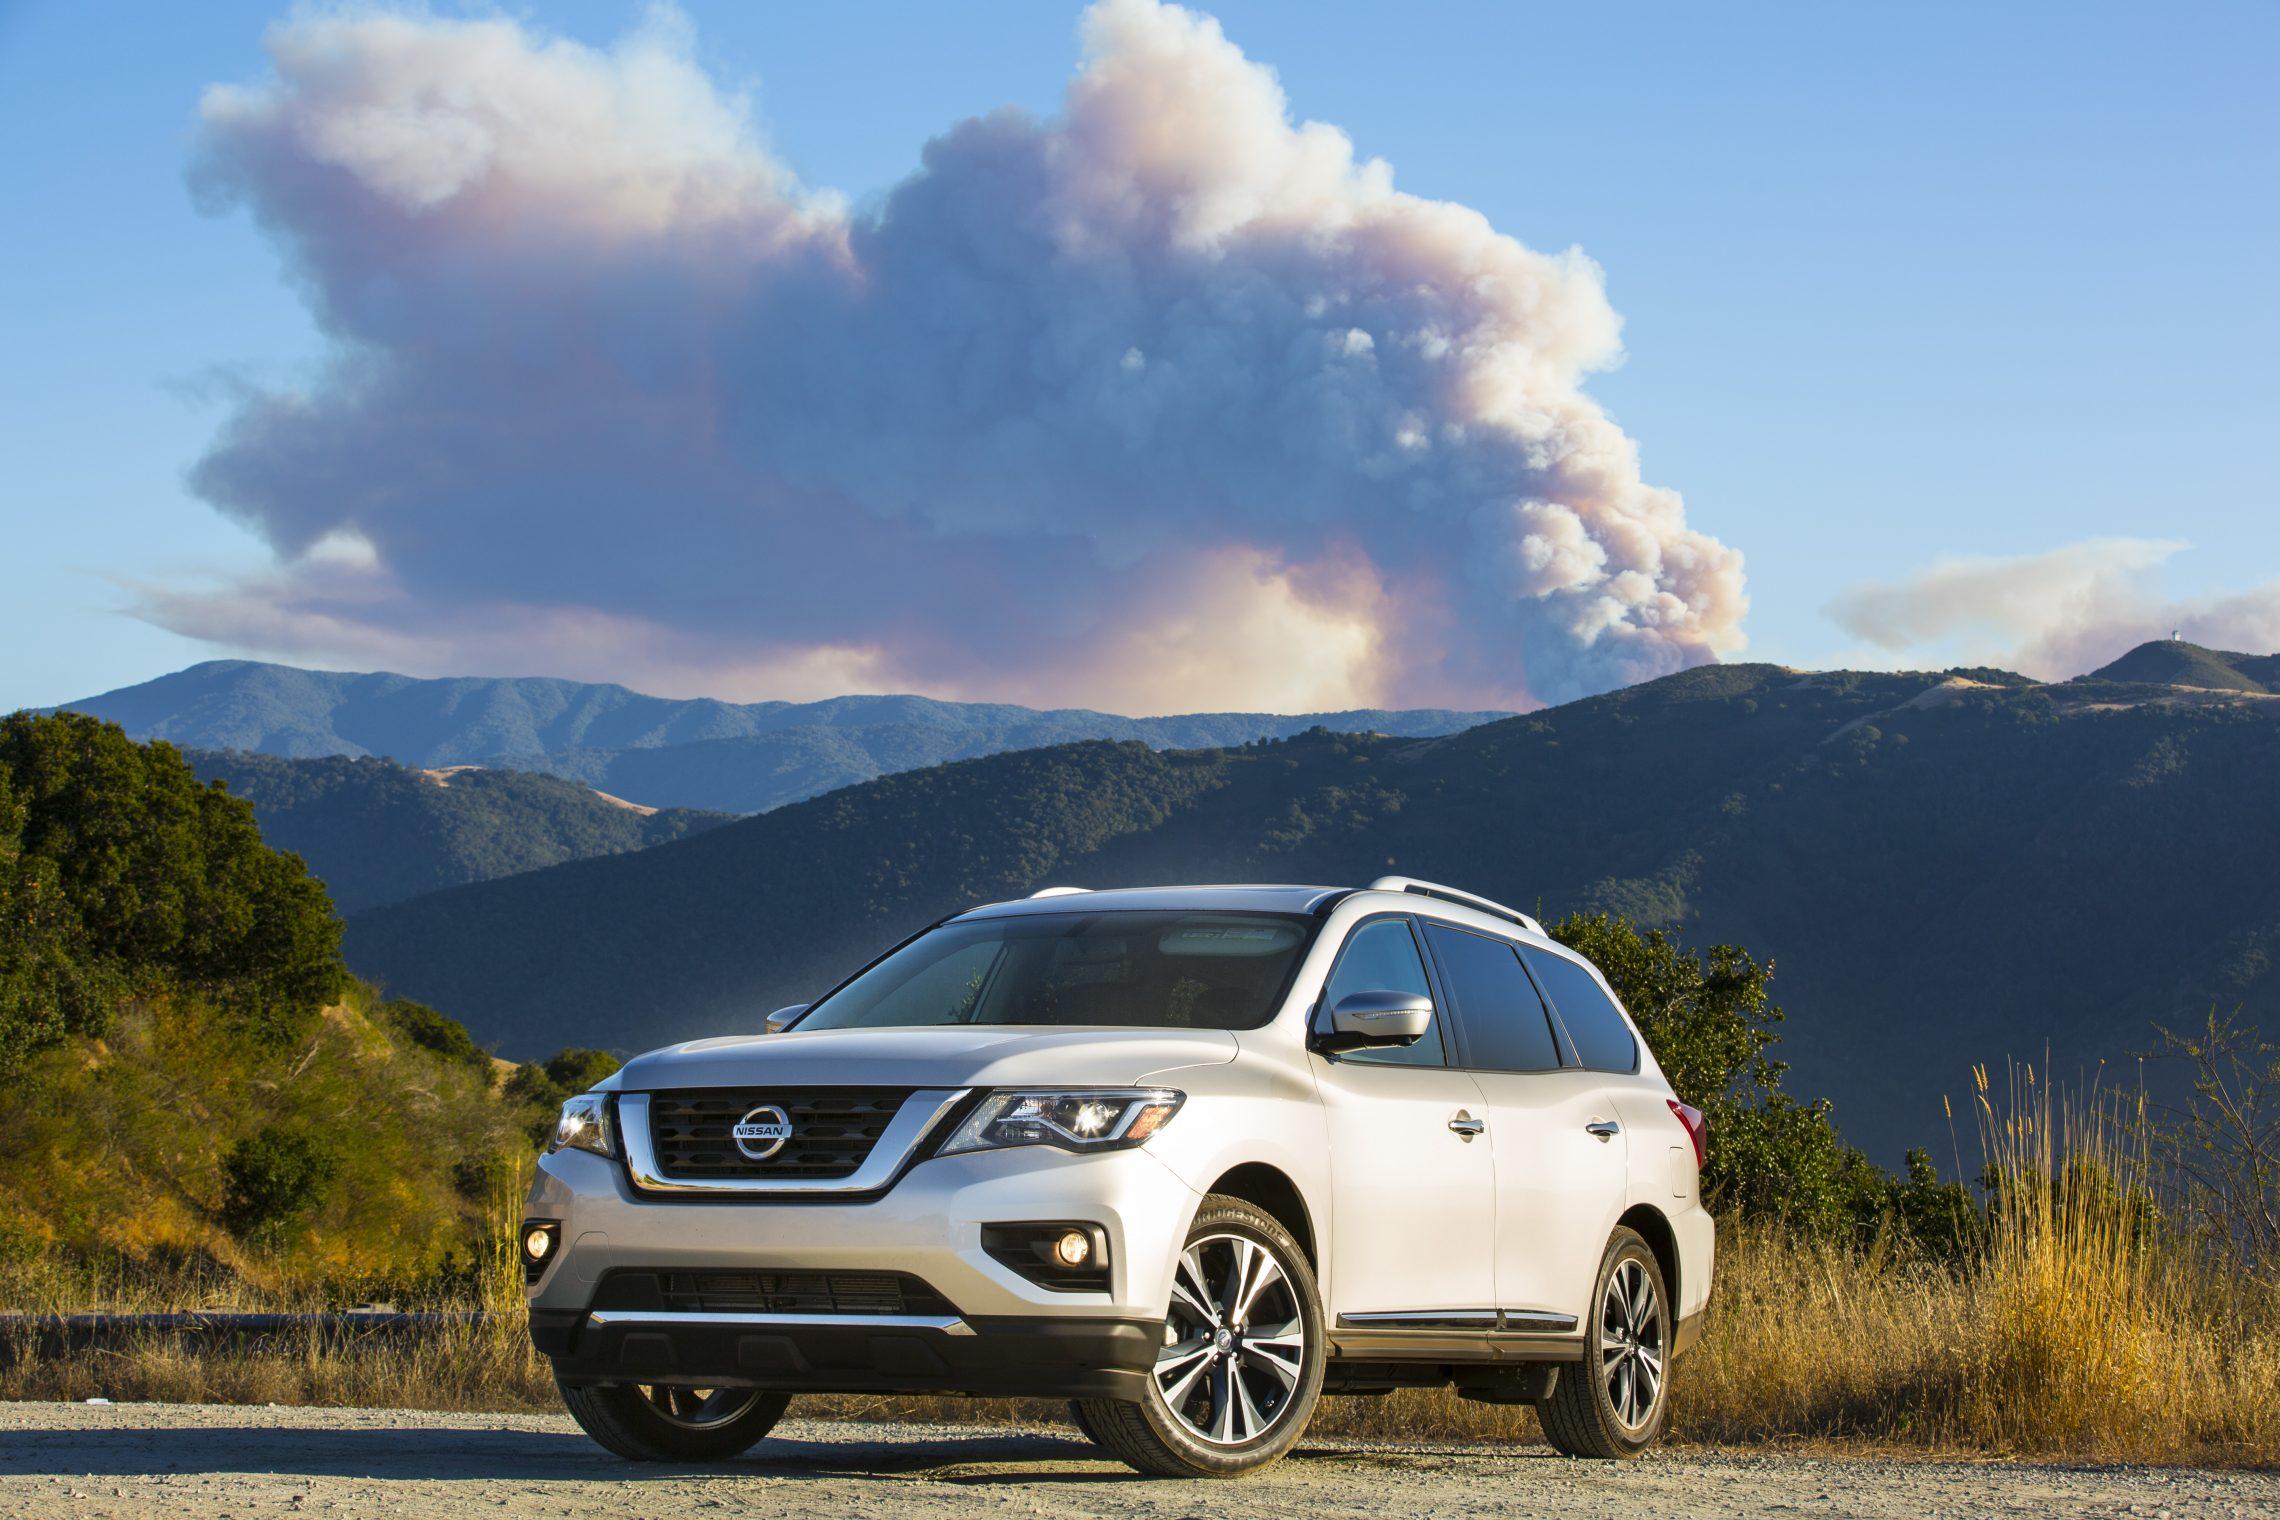 2018-Nissan-Pathfinder-Front